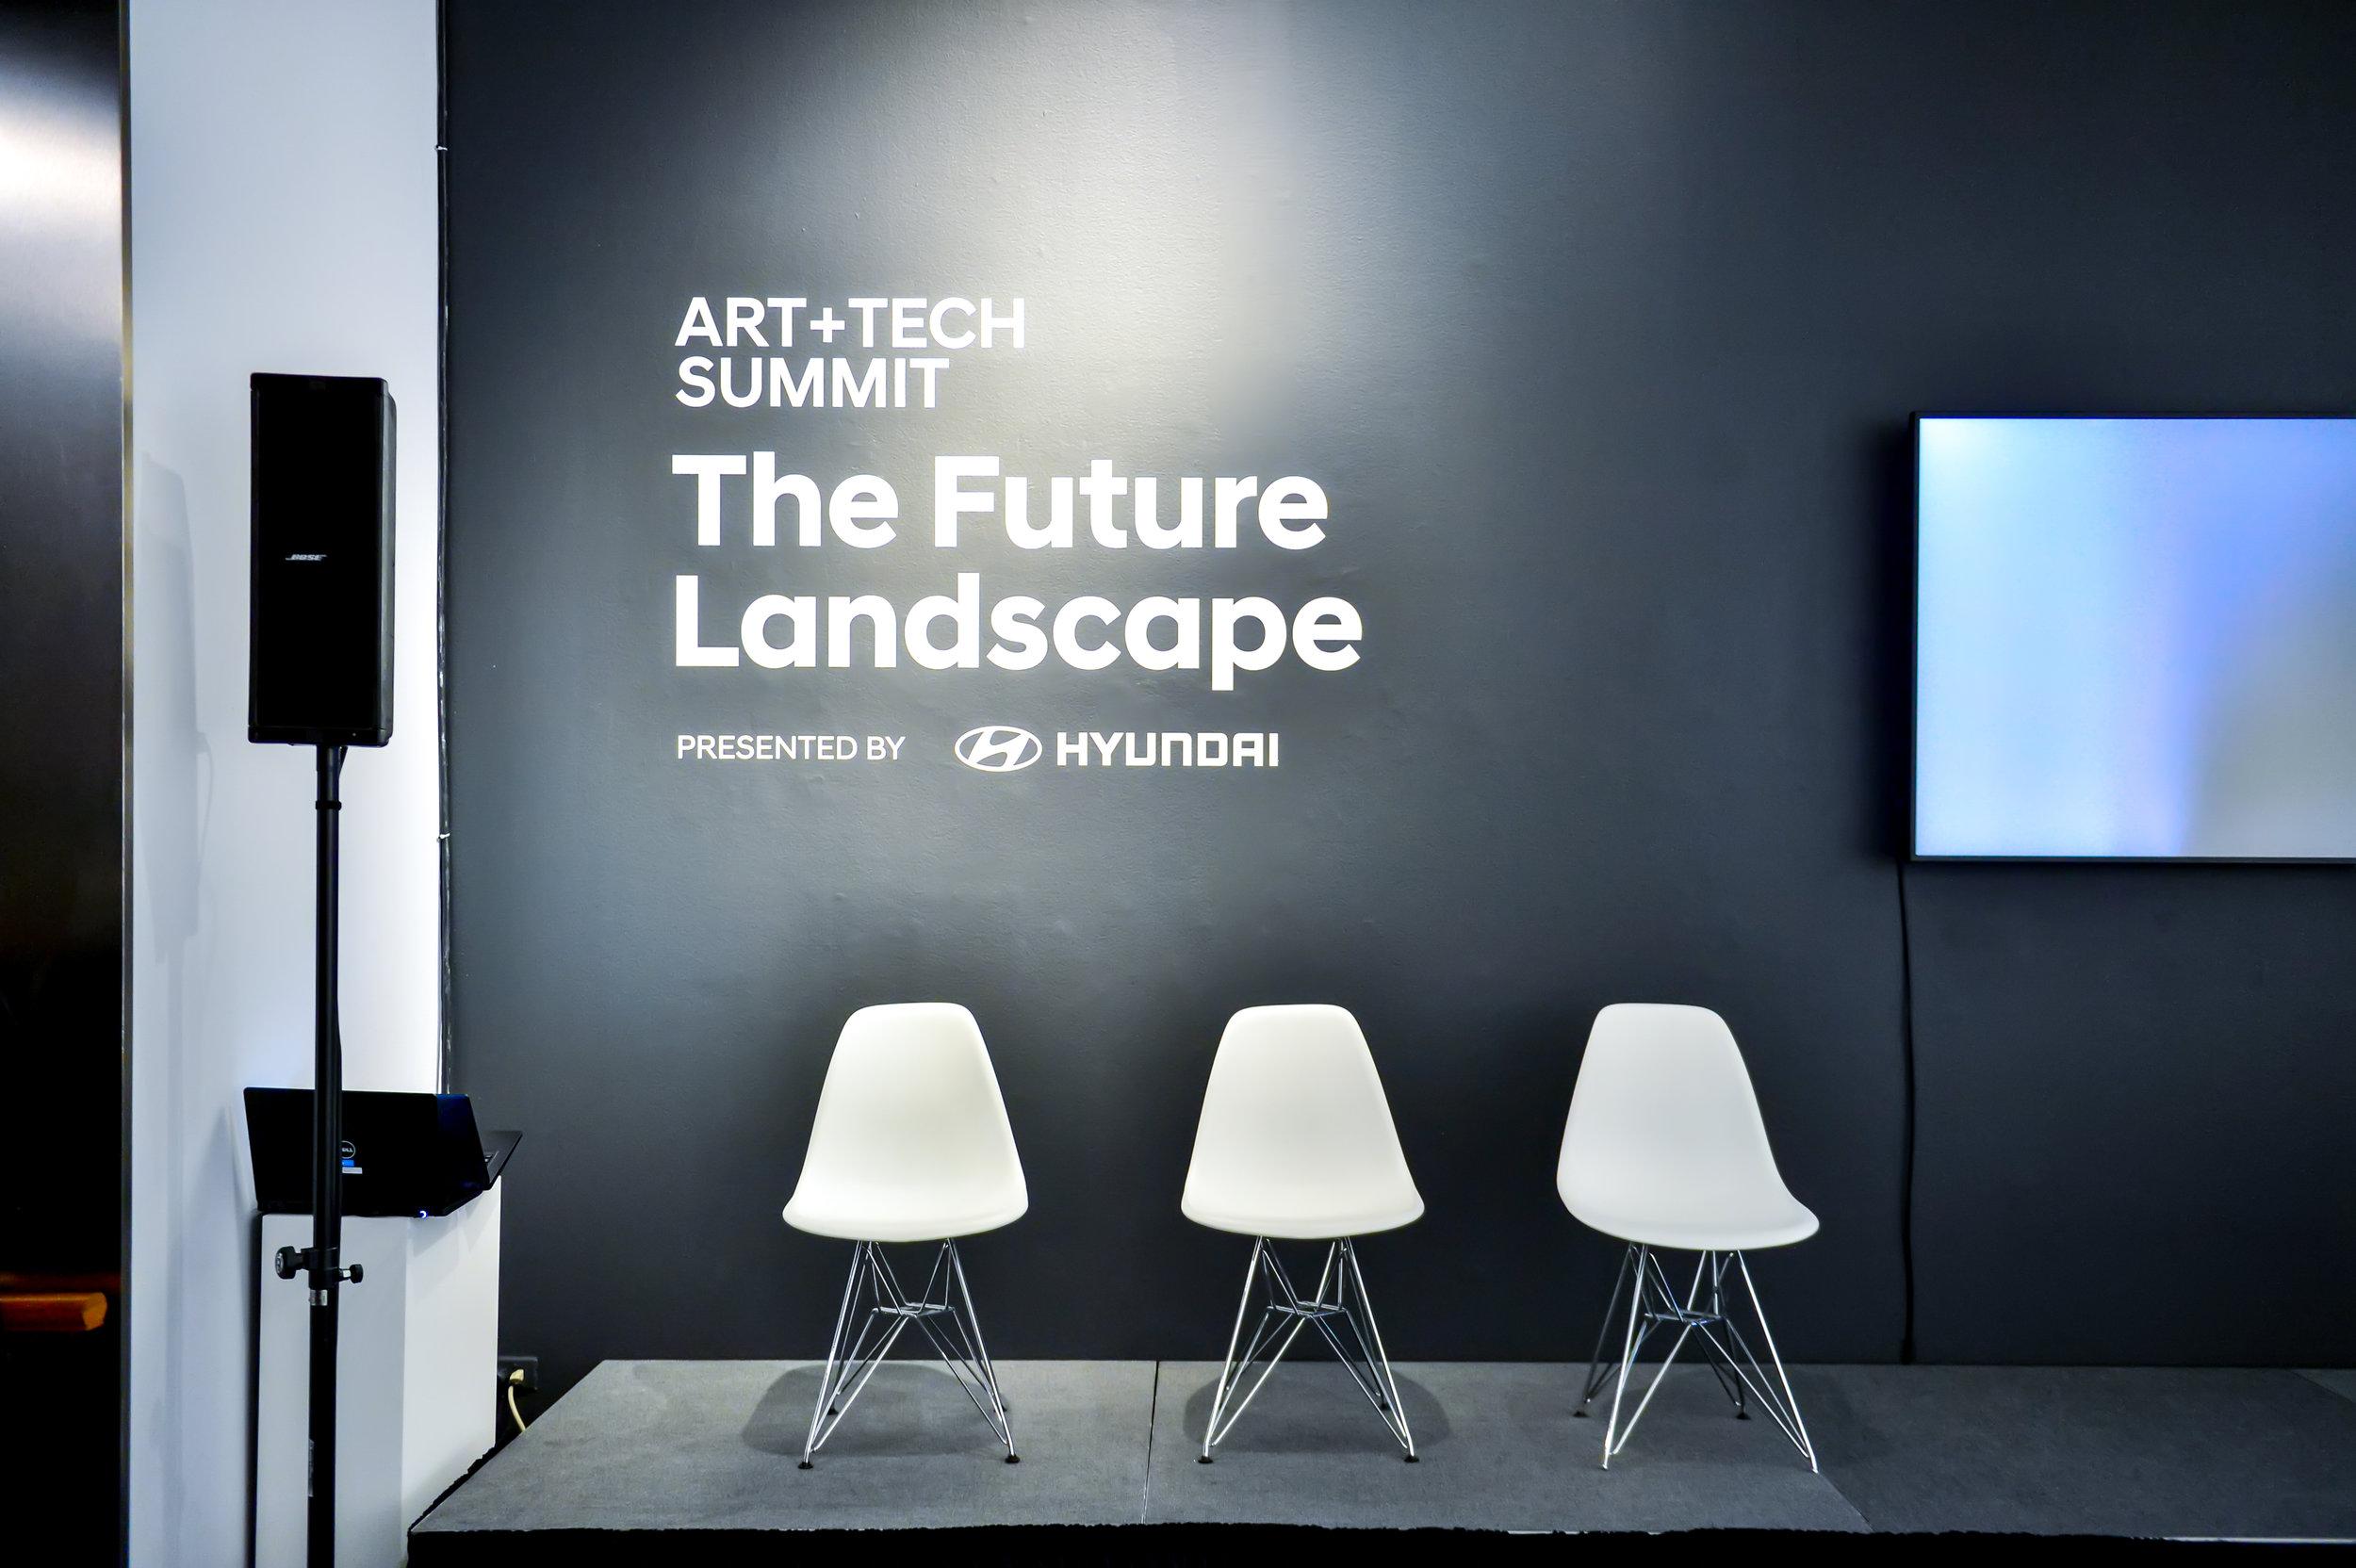 OHelloMedia-Hyundai-Christie'sAuctionHouse-6.28-TopSelect-6353.jpg